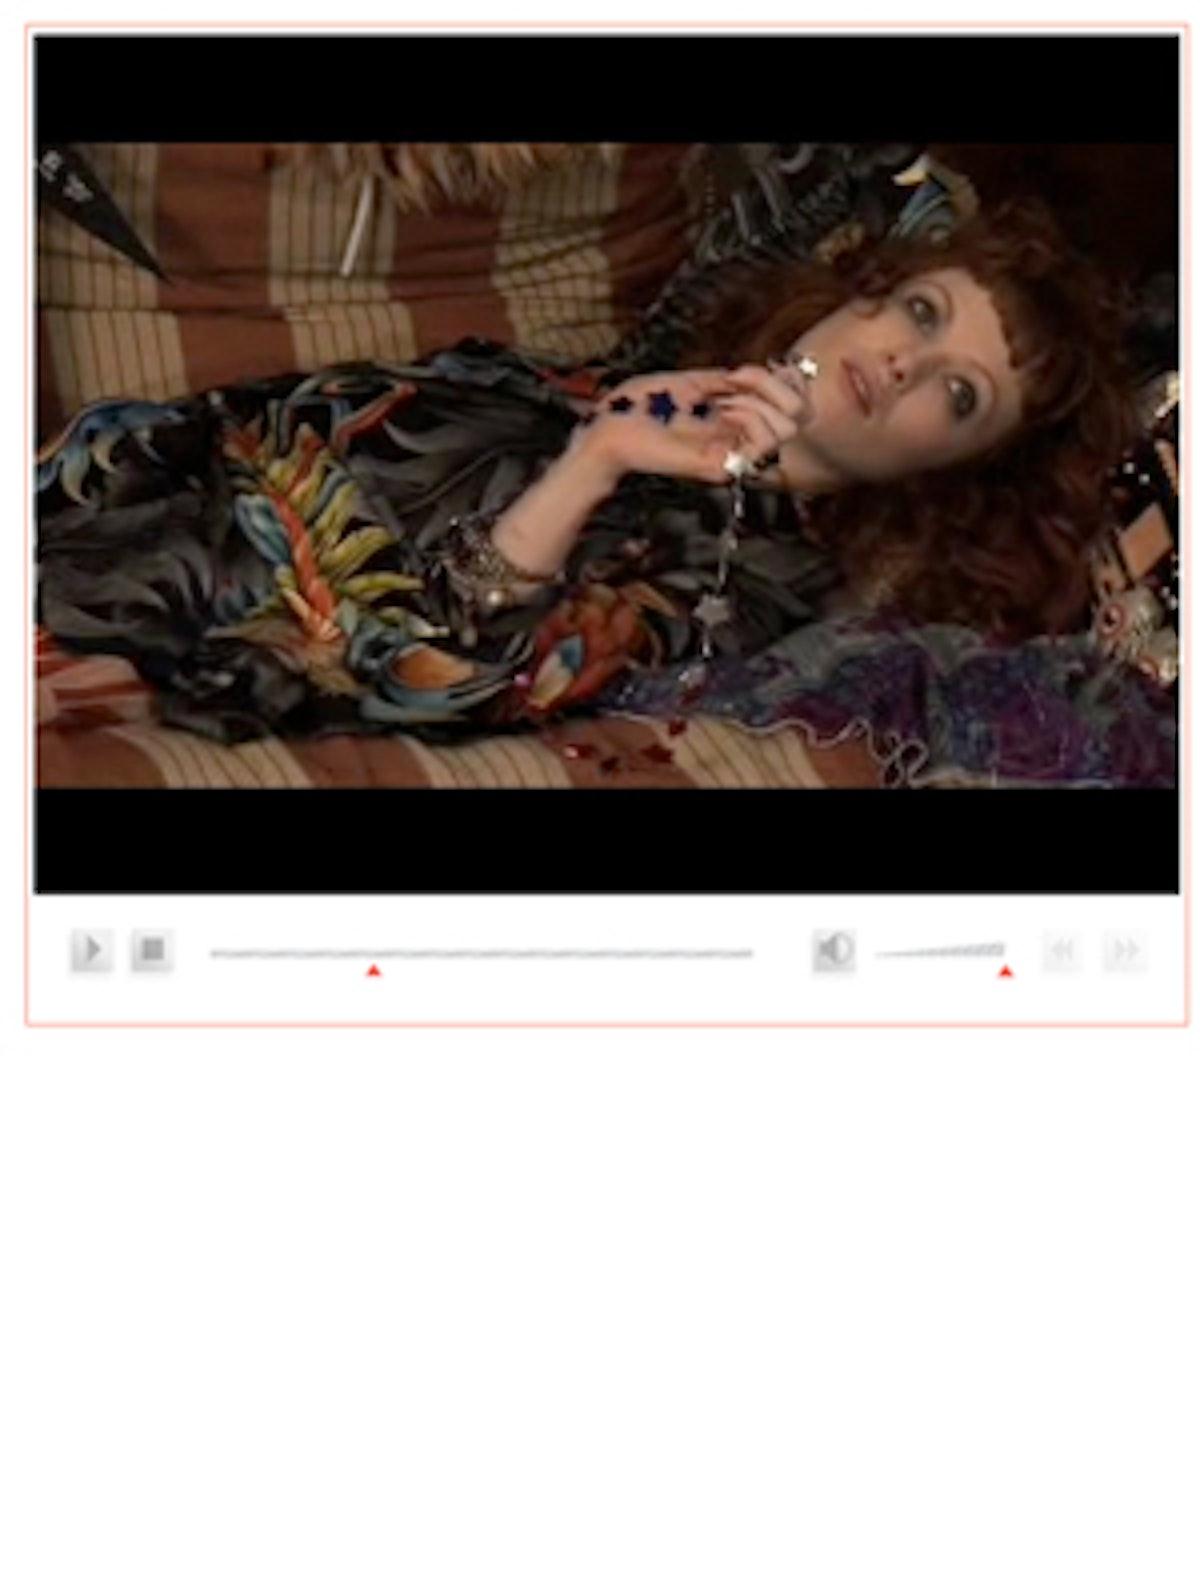 fass_nola_video_image.jpg